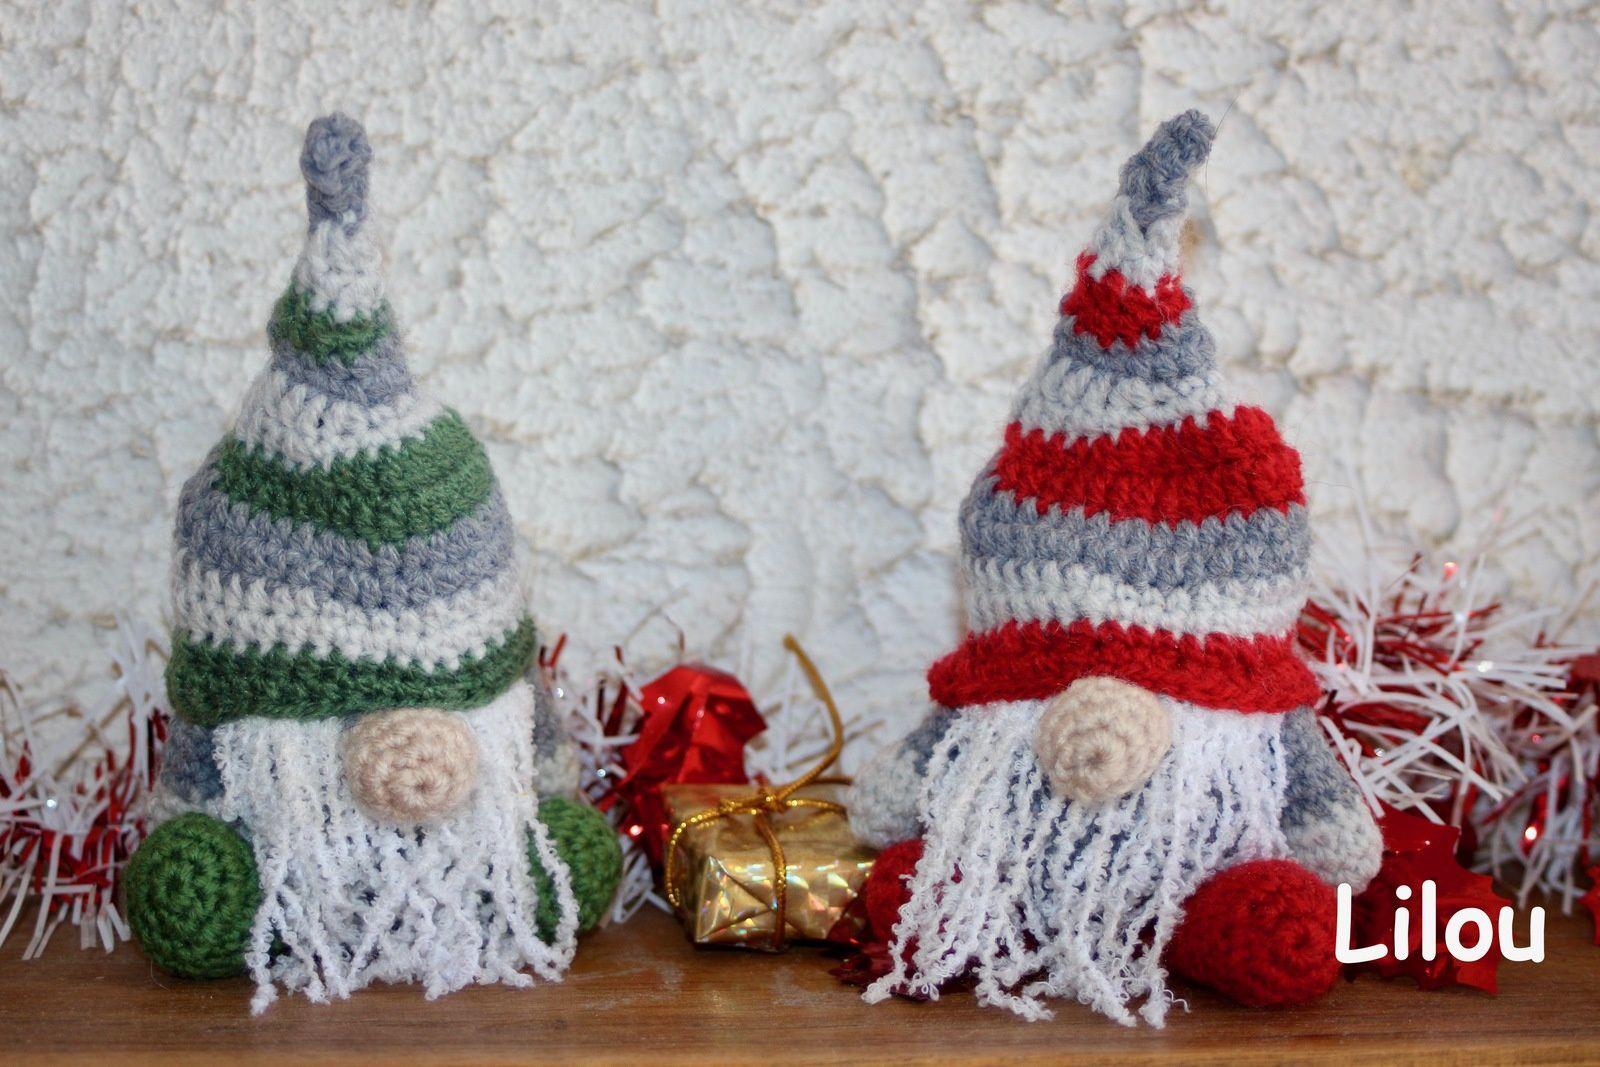 Gnome de noel au crochet DIY modele tuto gratuit